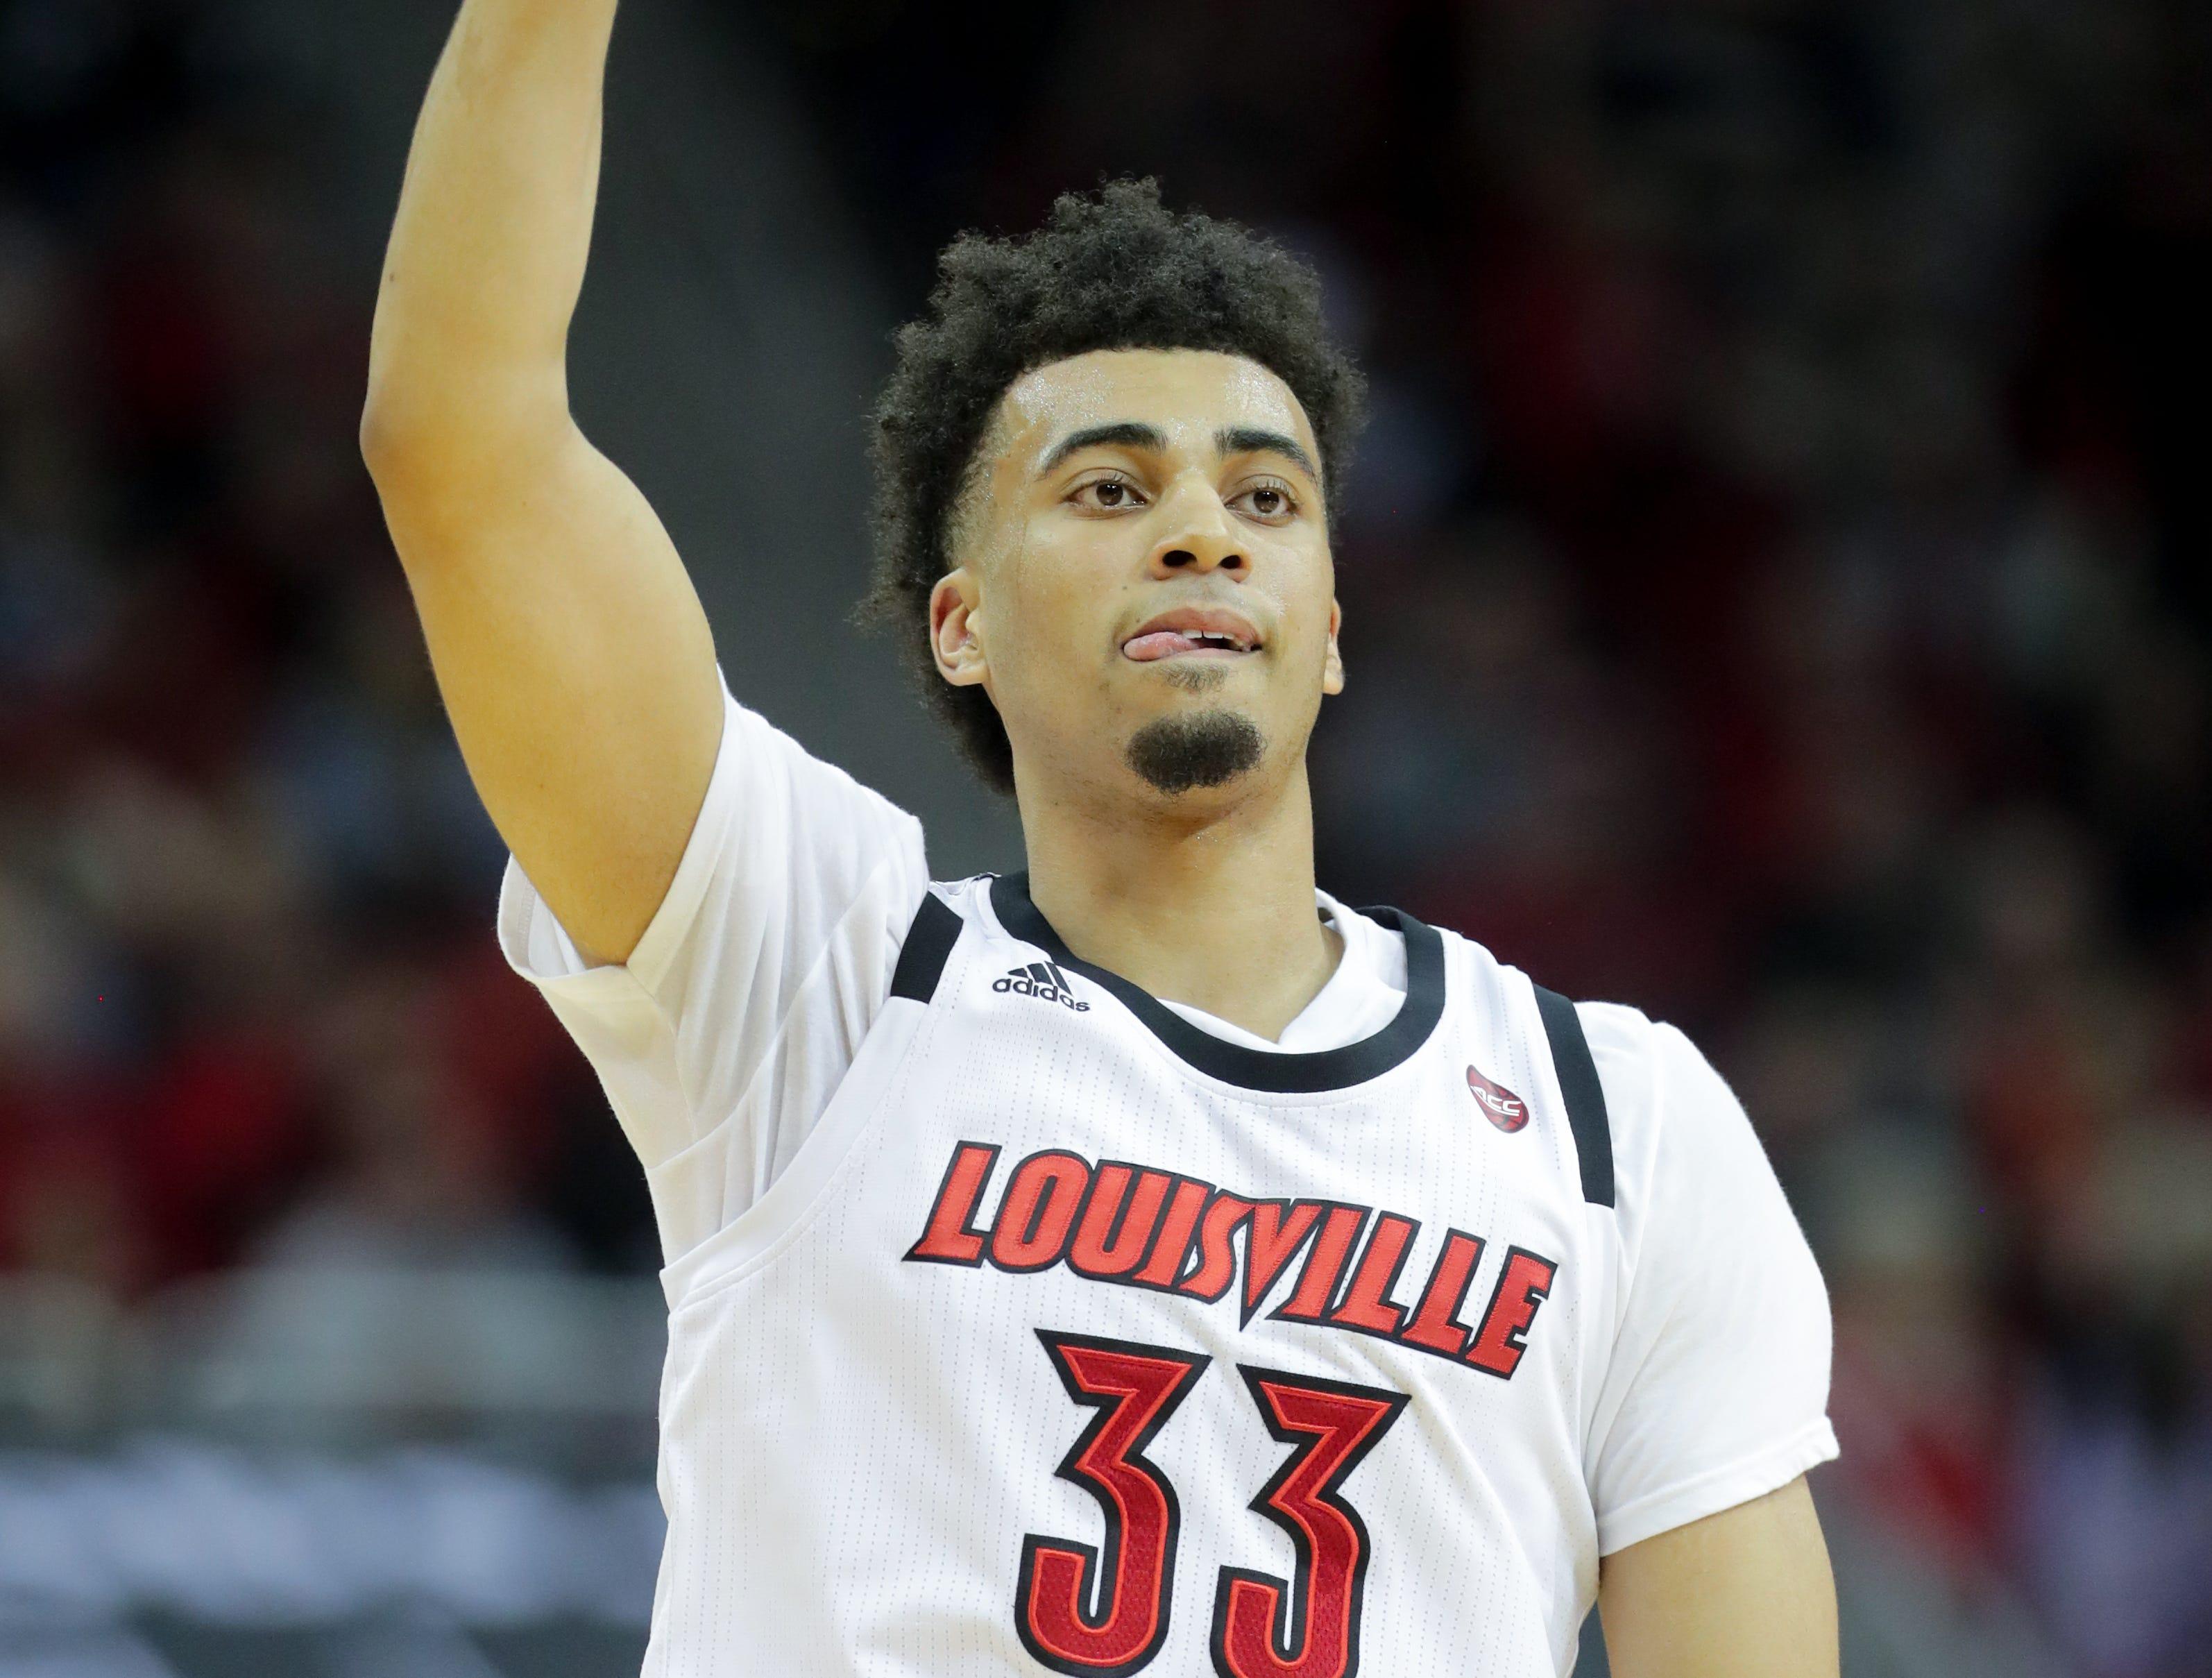 Louisville's Jordan Nwora celebrates after a monster dunk against Miami. Jan. 6, 2018